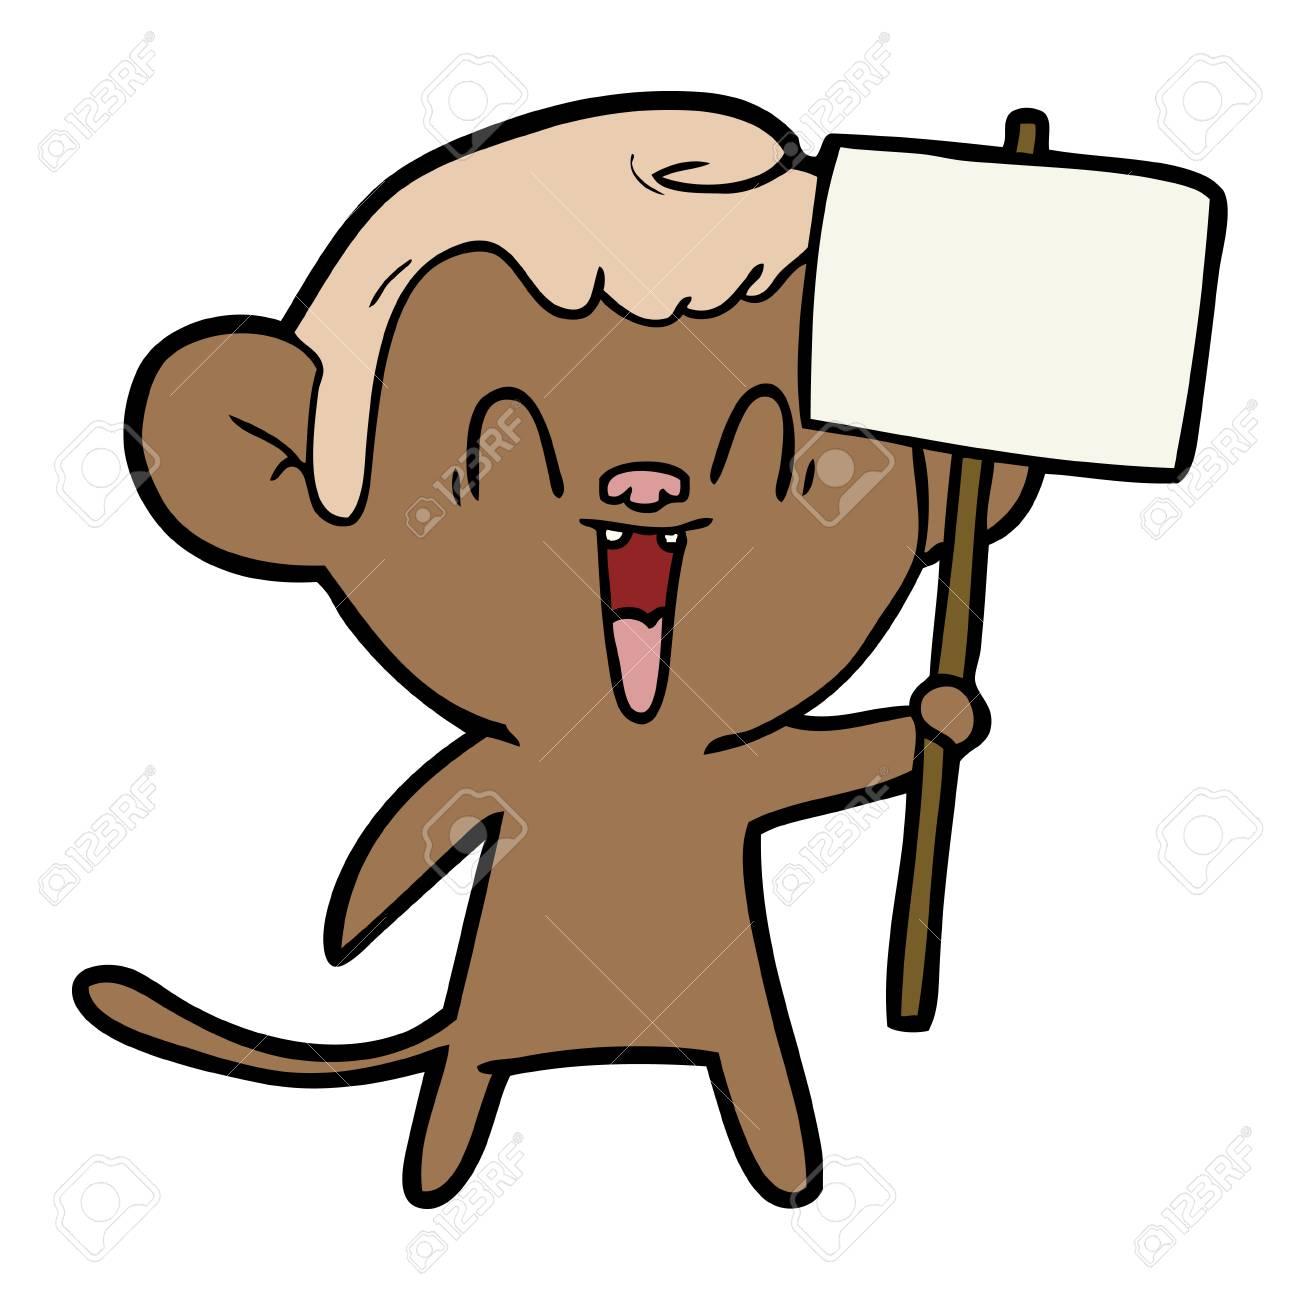 cartoon laughing monkey ロイヤリティフリークリップアート ベクター